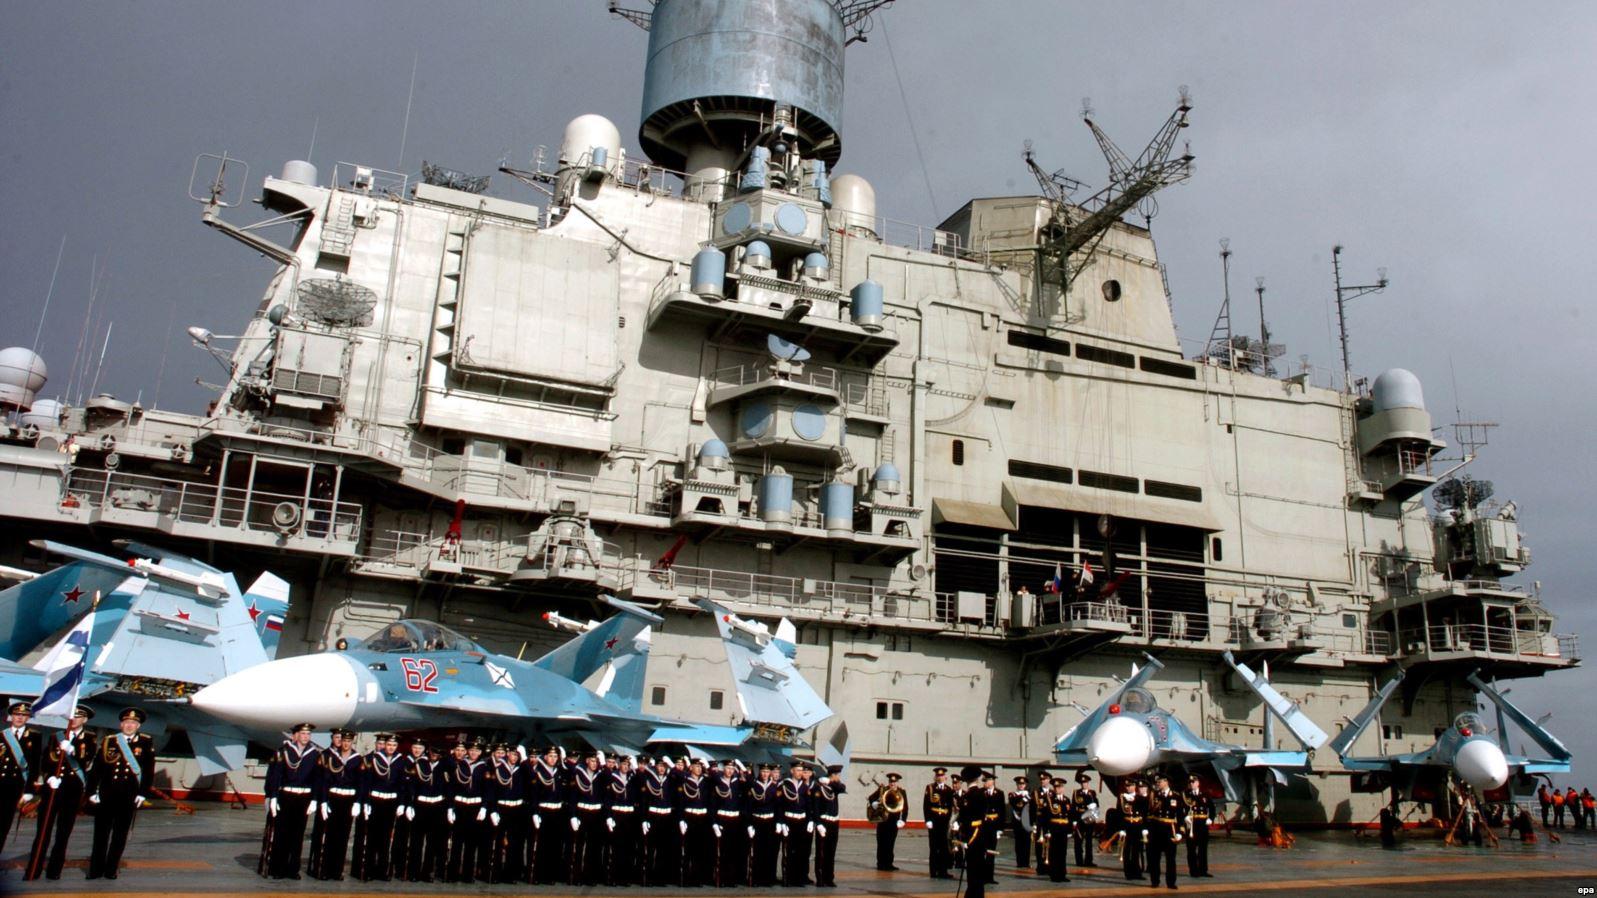 Aircraft Carrier Admiral Kuznetsov: News #2 - Page 2 EFD30757-B282-4704-98D3-1A09A3DB3D0F_cx0_cy8_cw0_w1597_n_r1_s